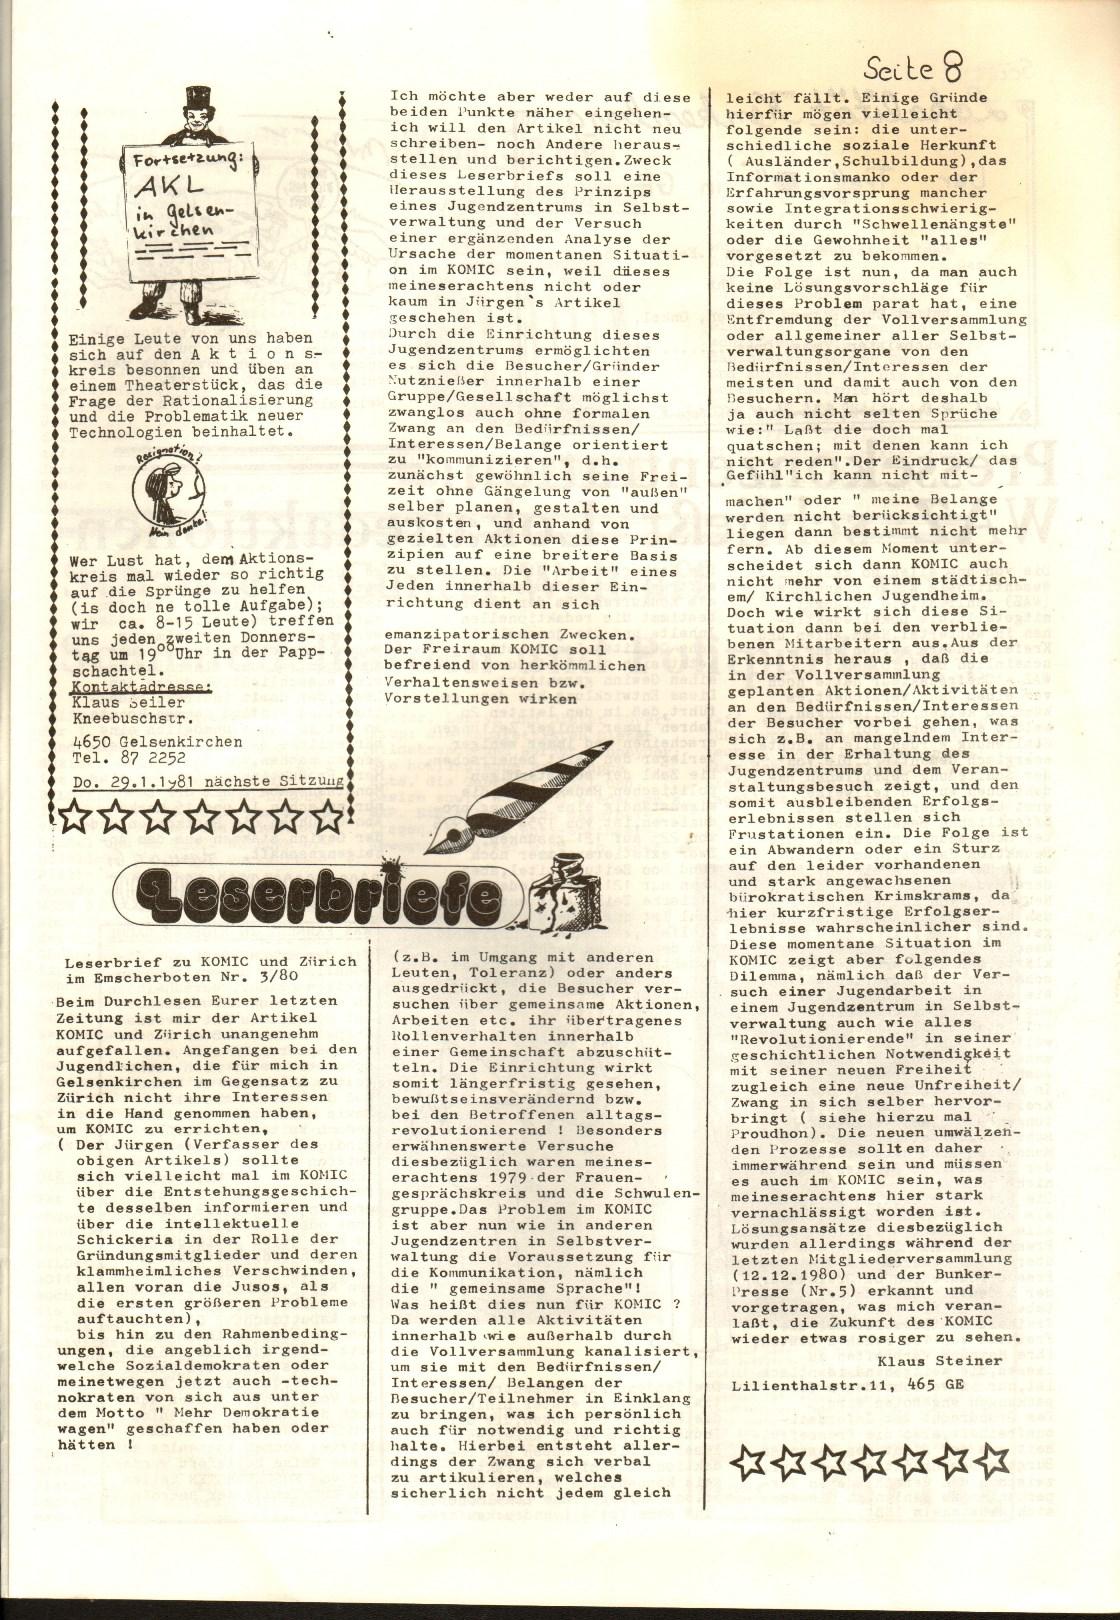 Gelsenkirchen_Emscherbote_1981_04_09